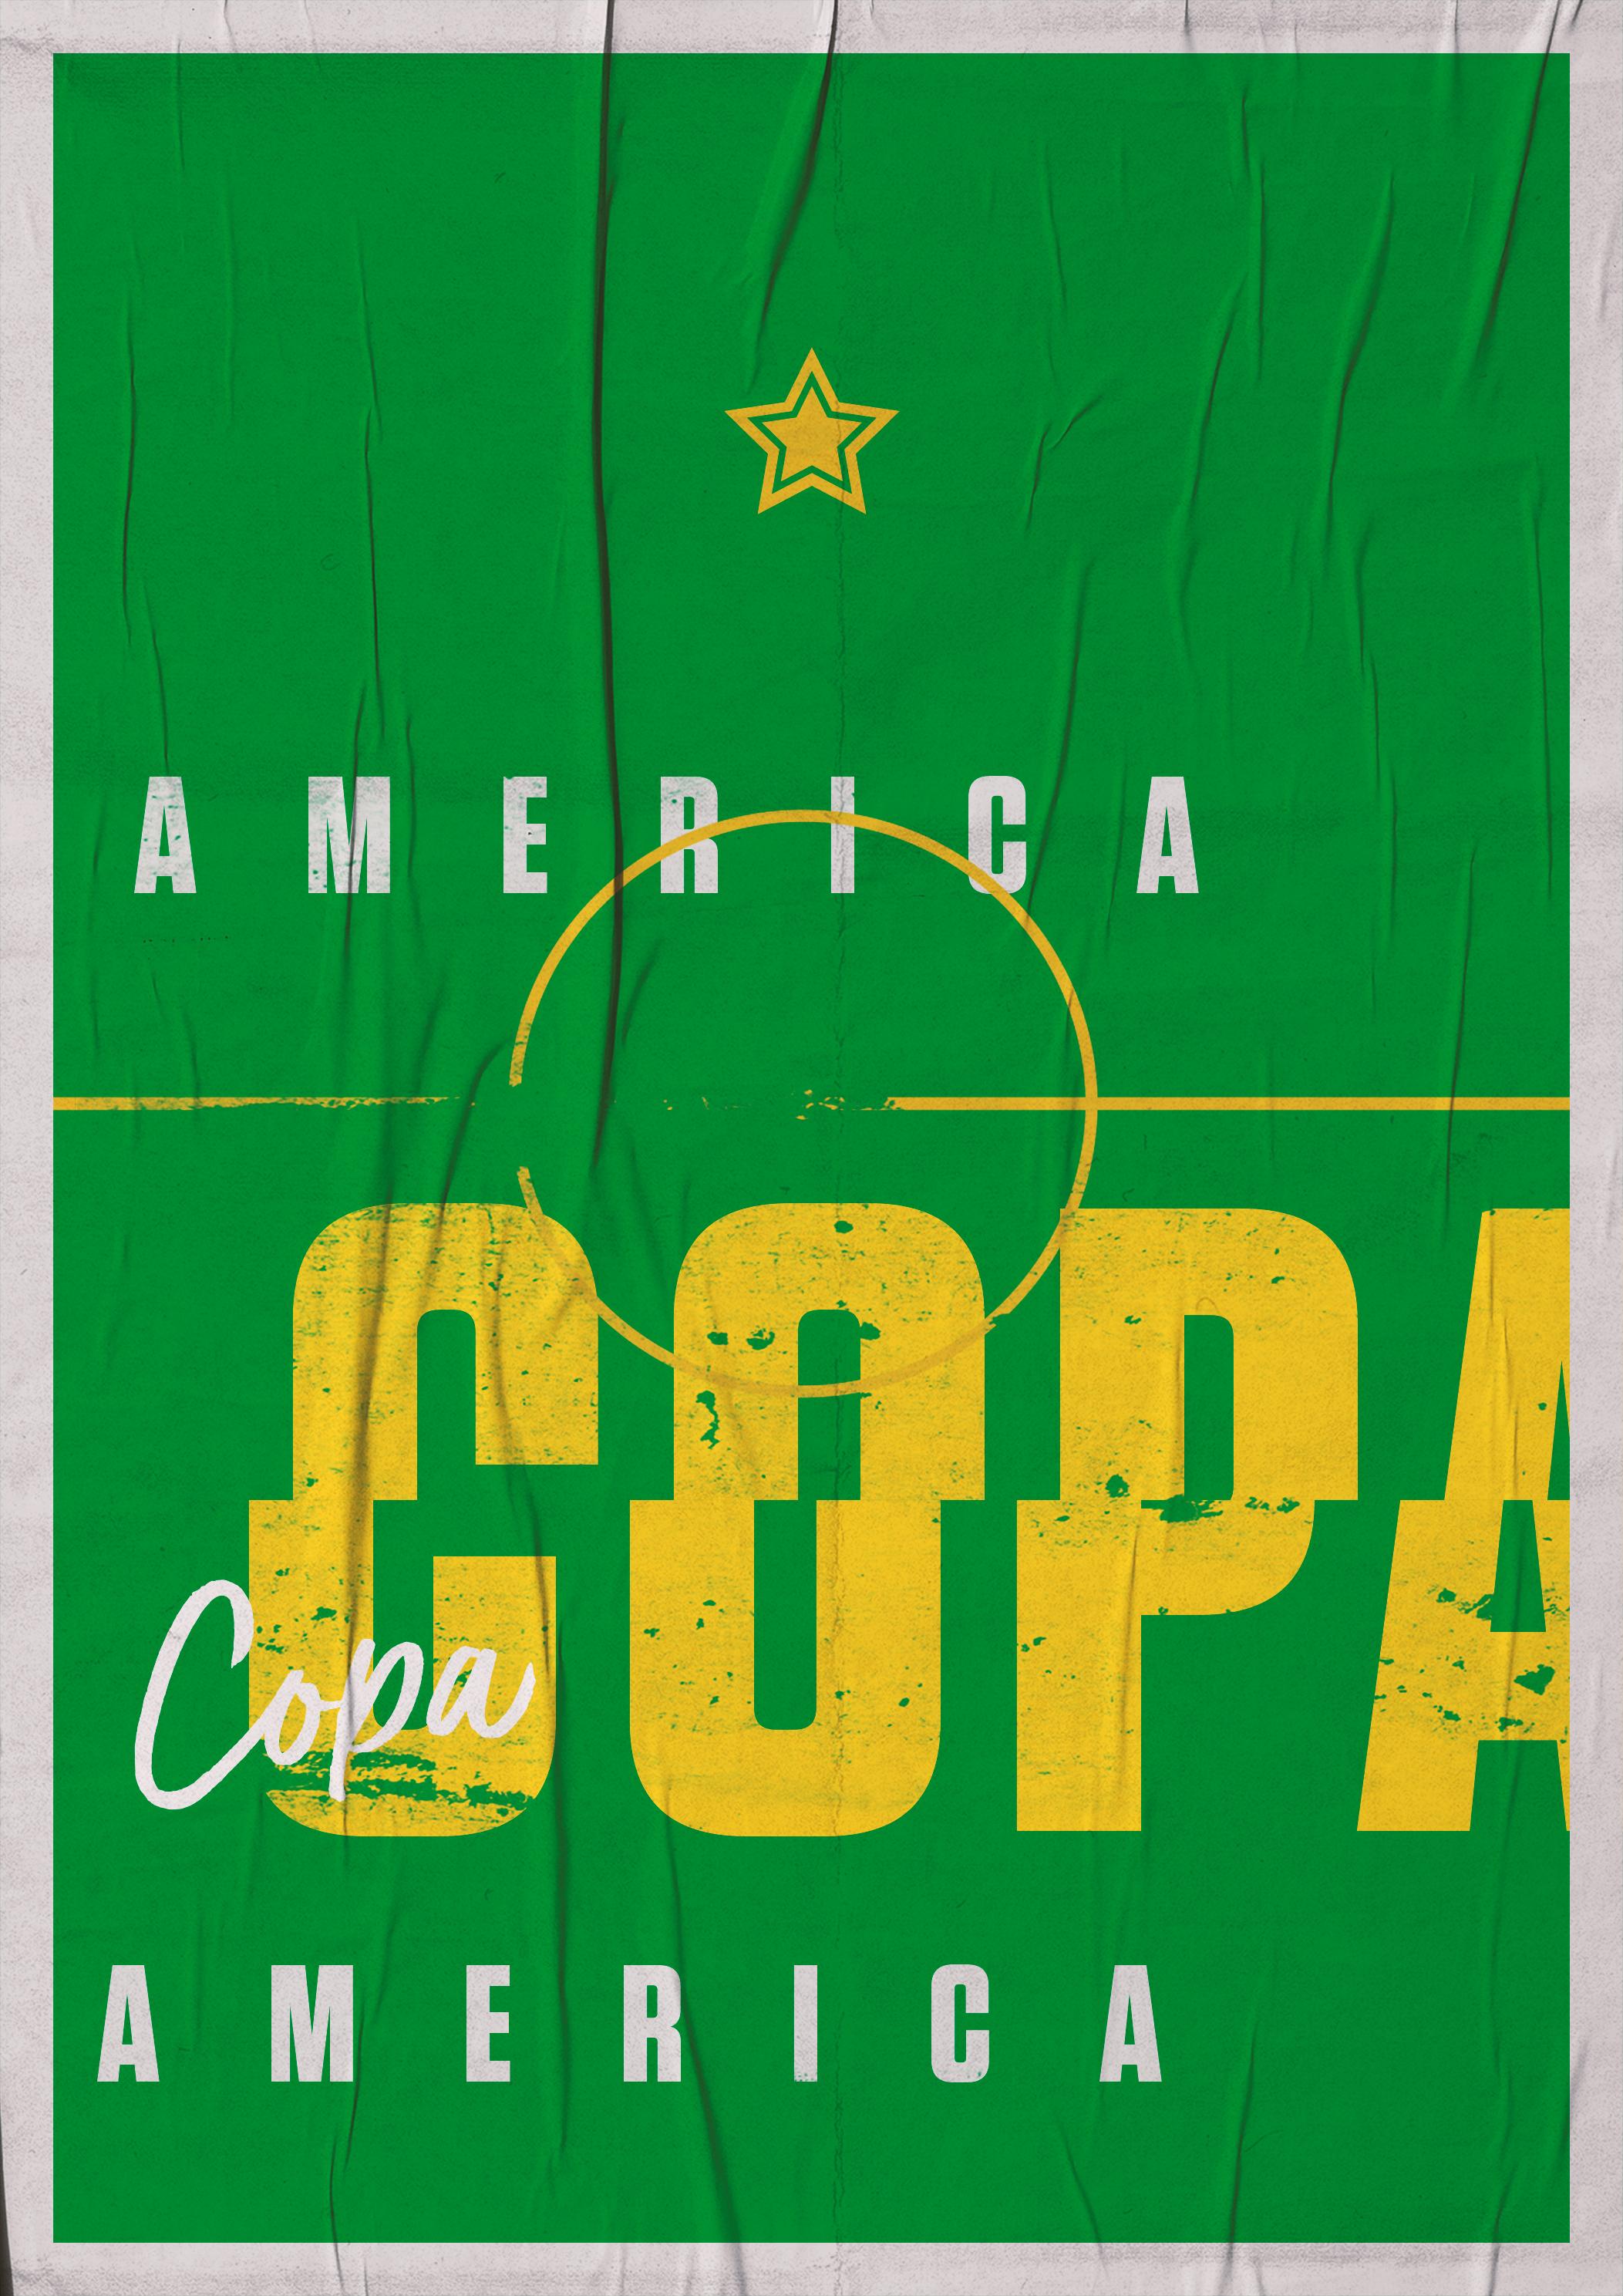 COPA_america_poster02 copy.jpg